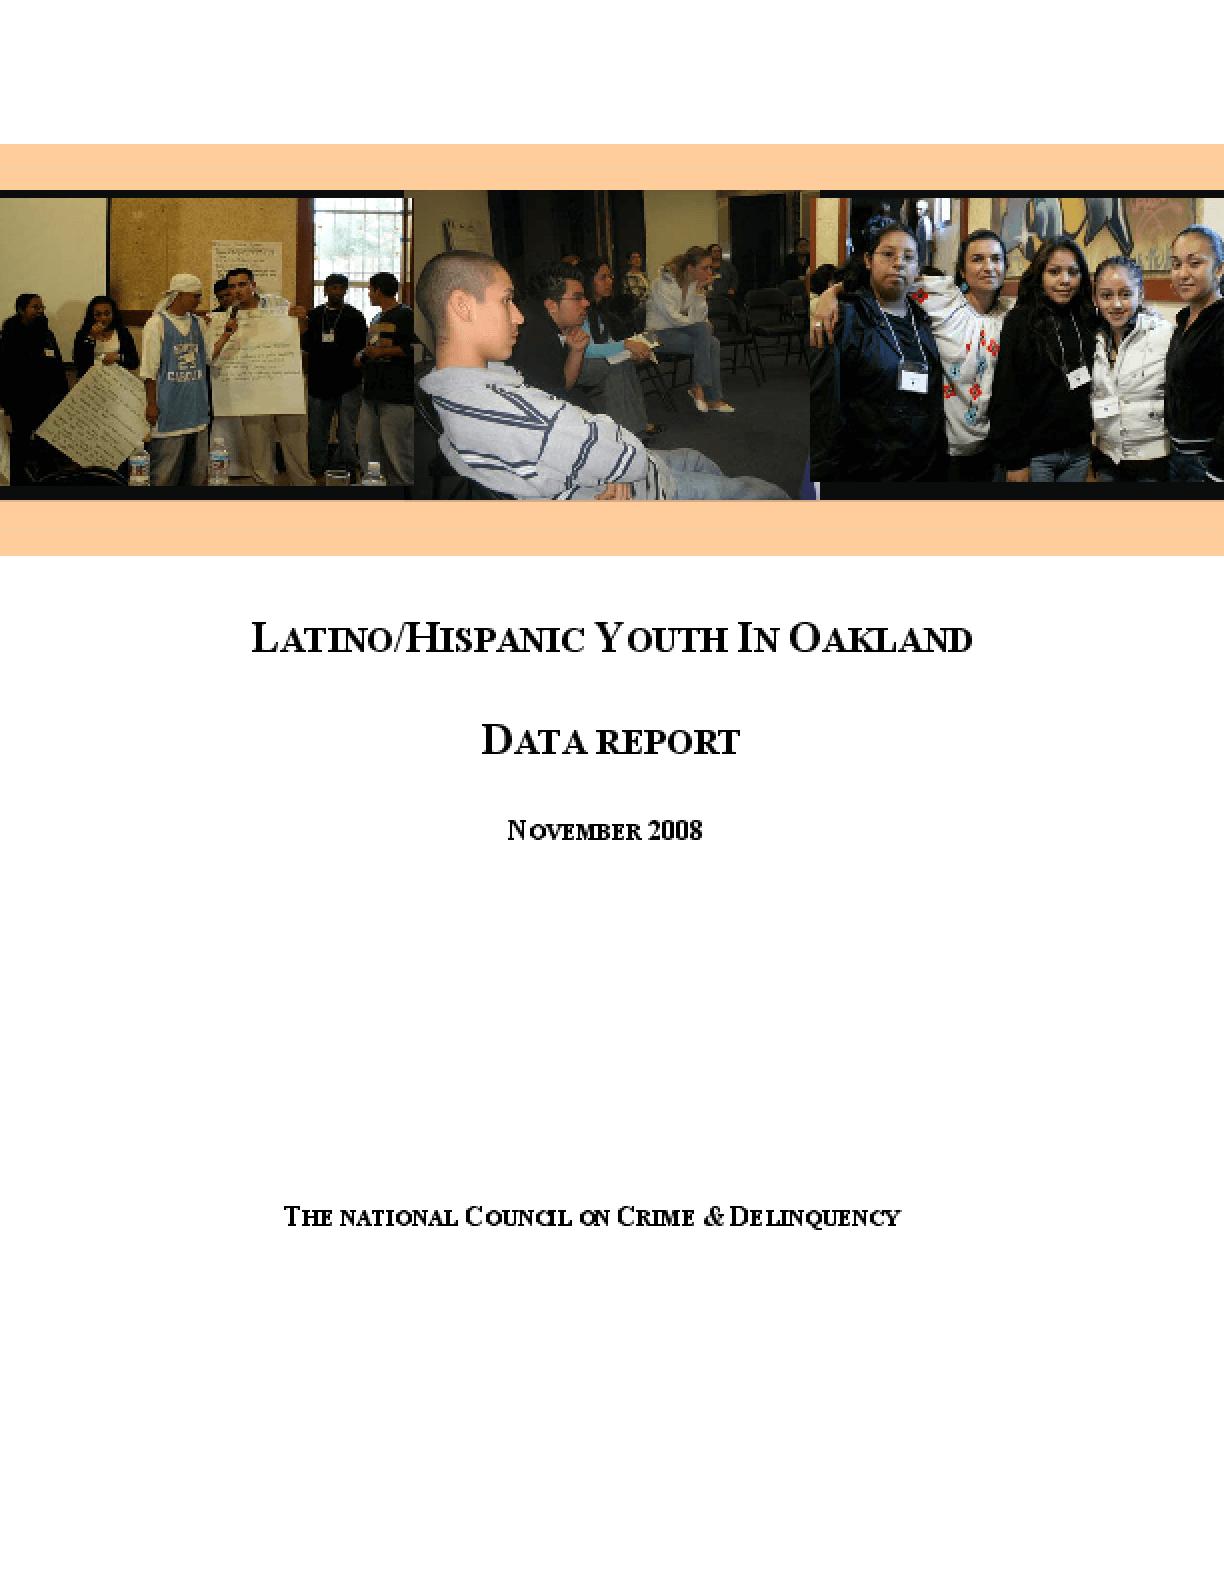 Latino/Hispanic Youth in Oakland (Data Report)